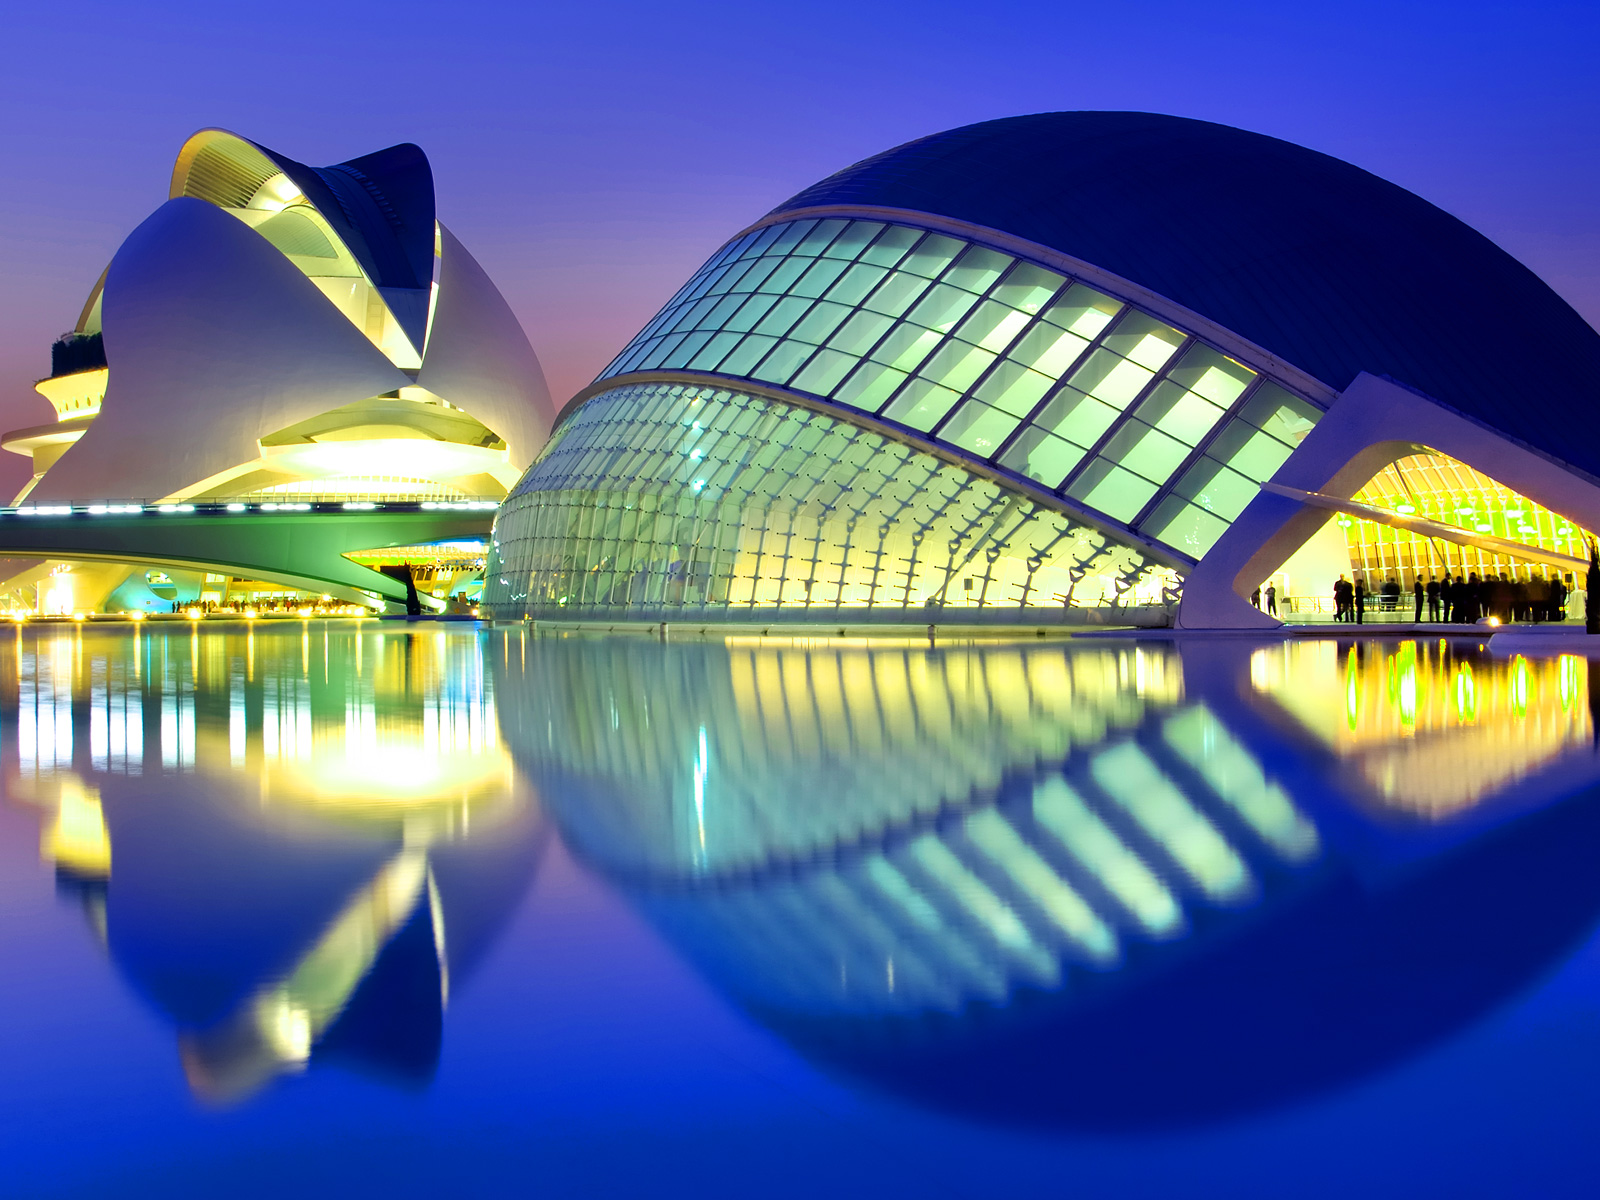 Valencia - Vincci Hoteles